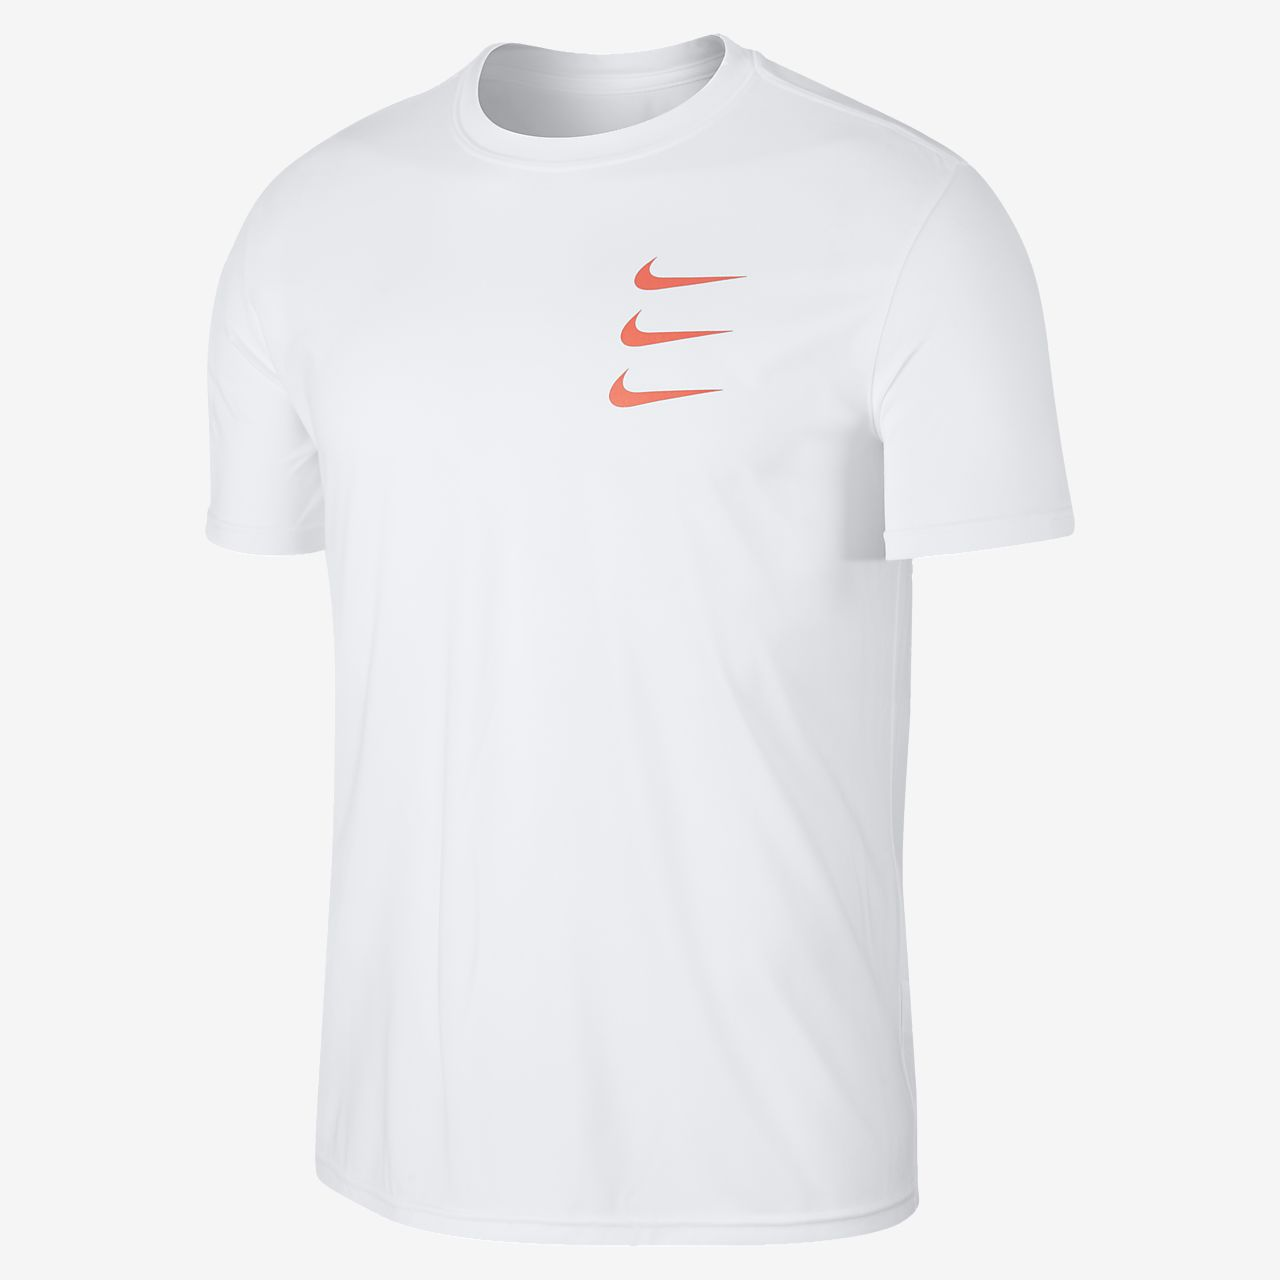 279c38a7 Nike Dri-FIT (London) Men's Running T-Shirt. Nike.com GB